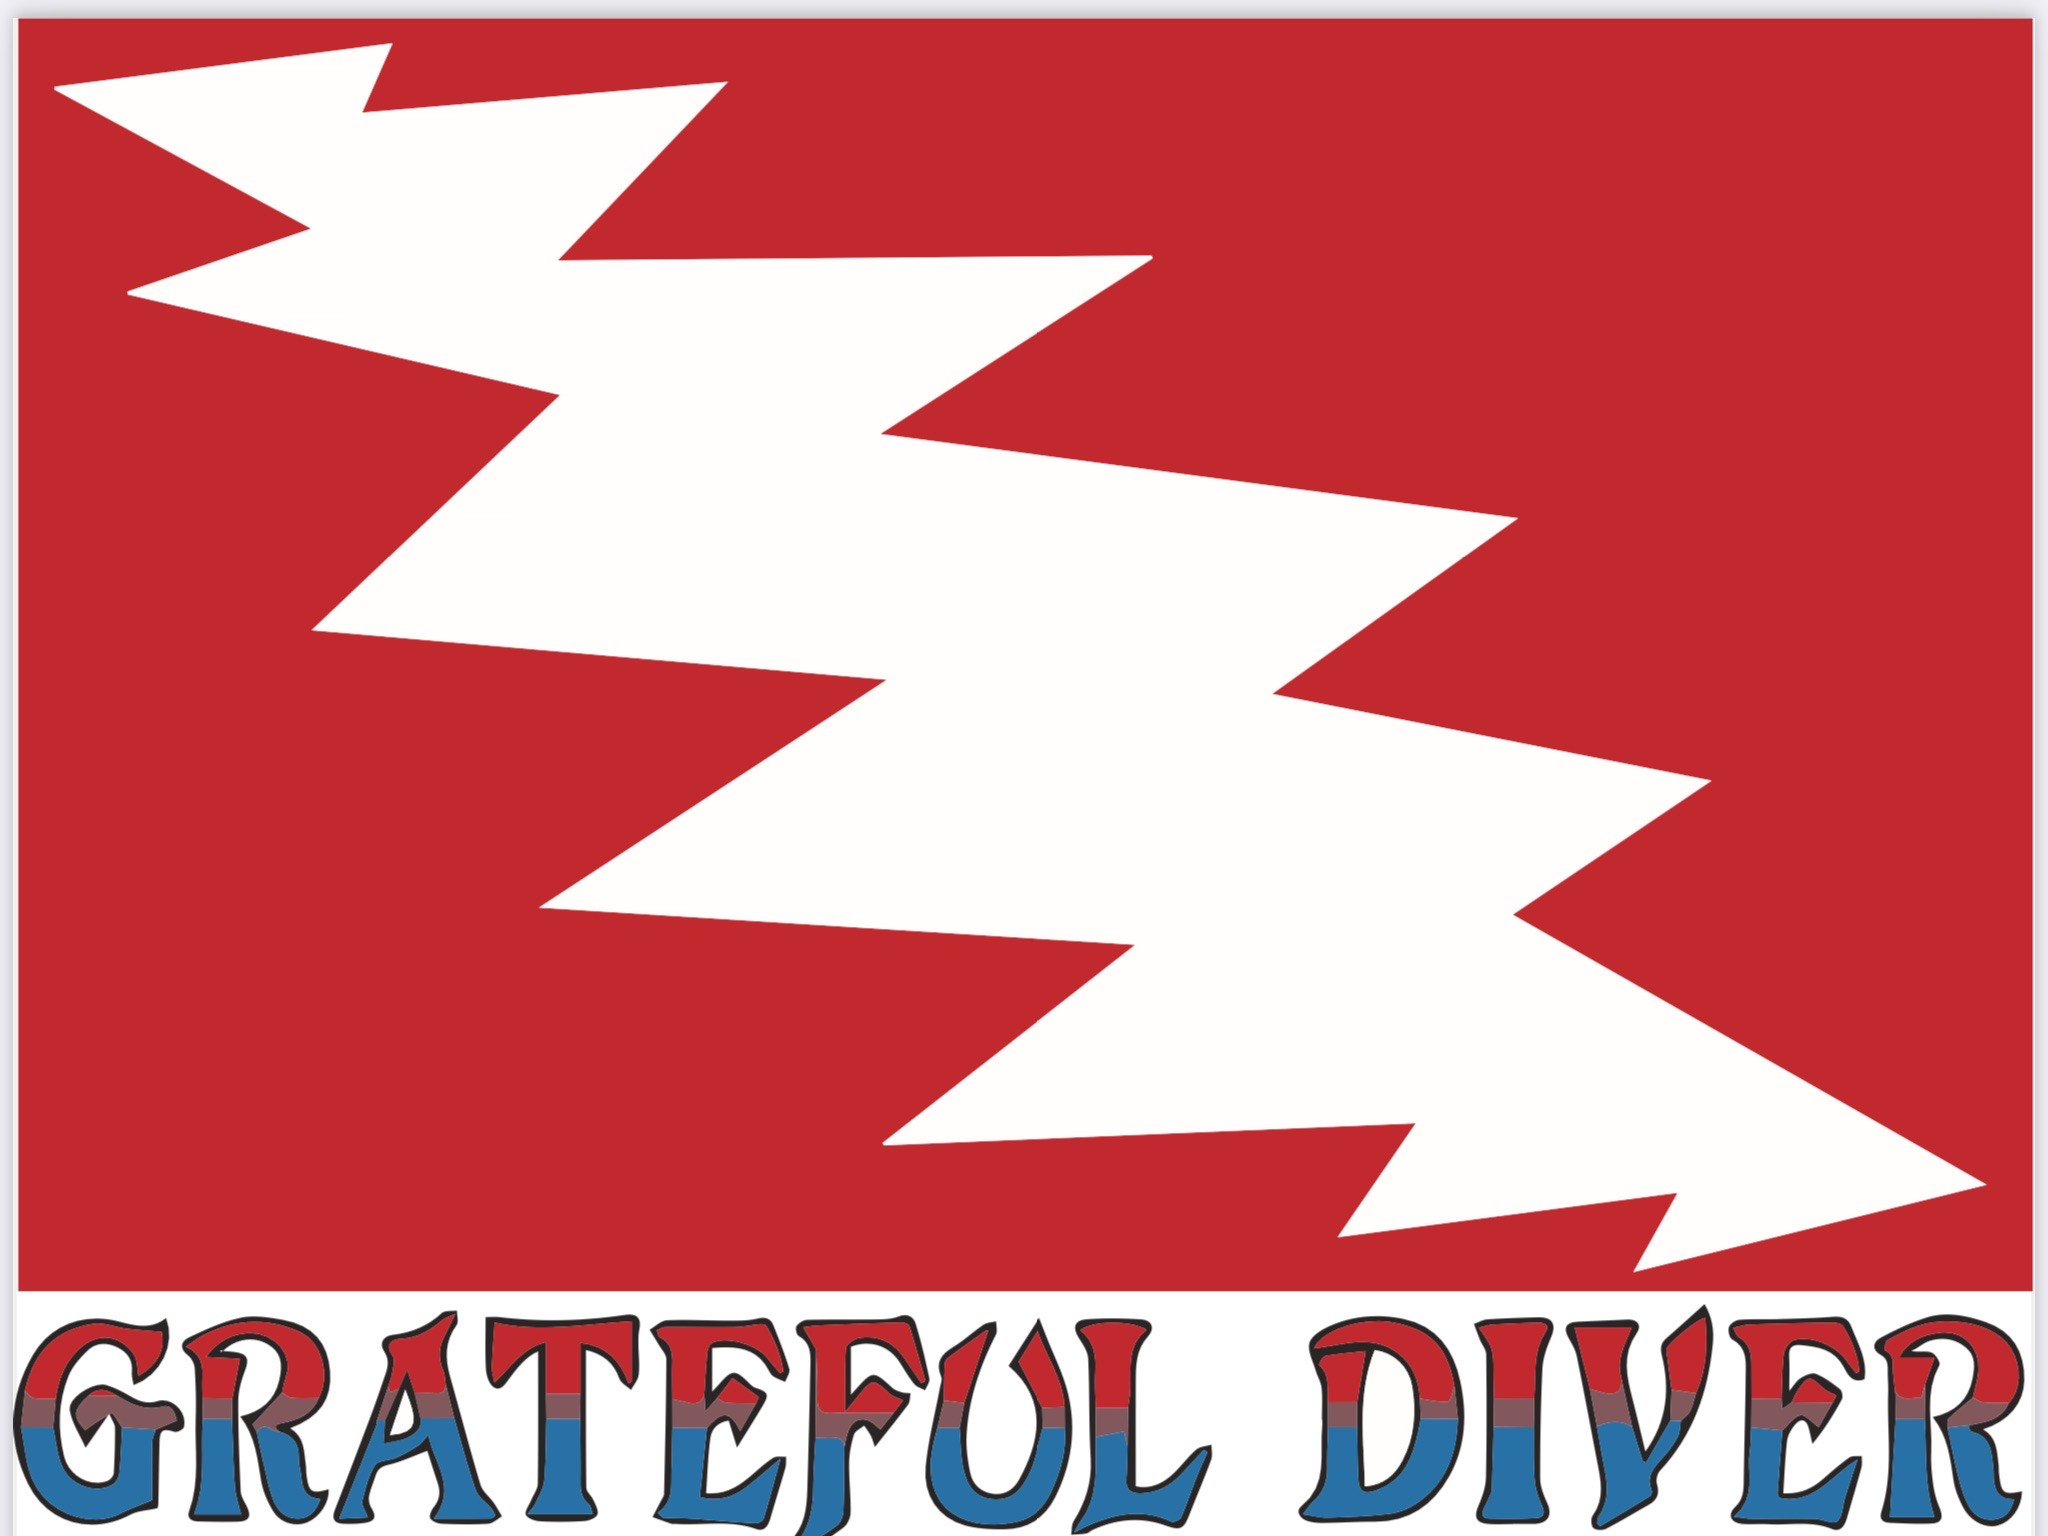 The Grateful Diver